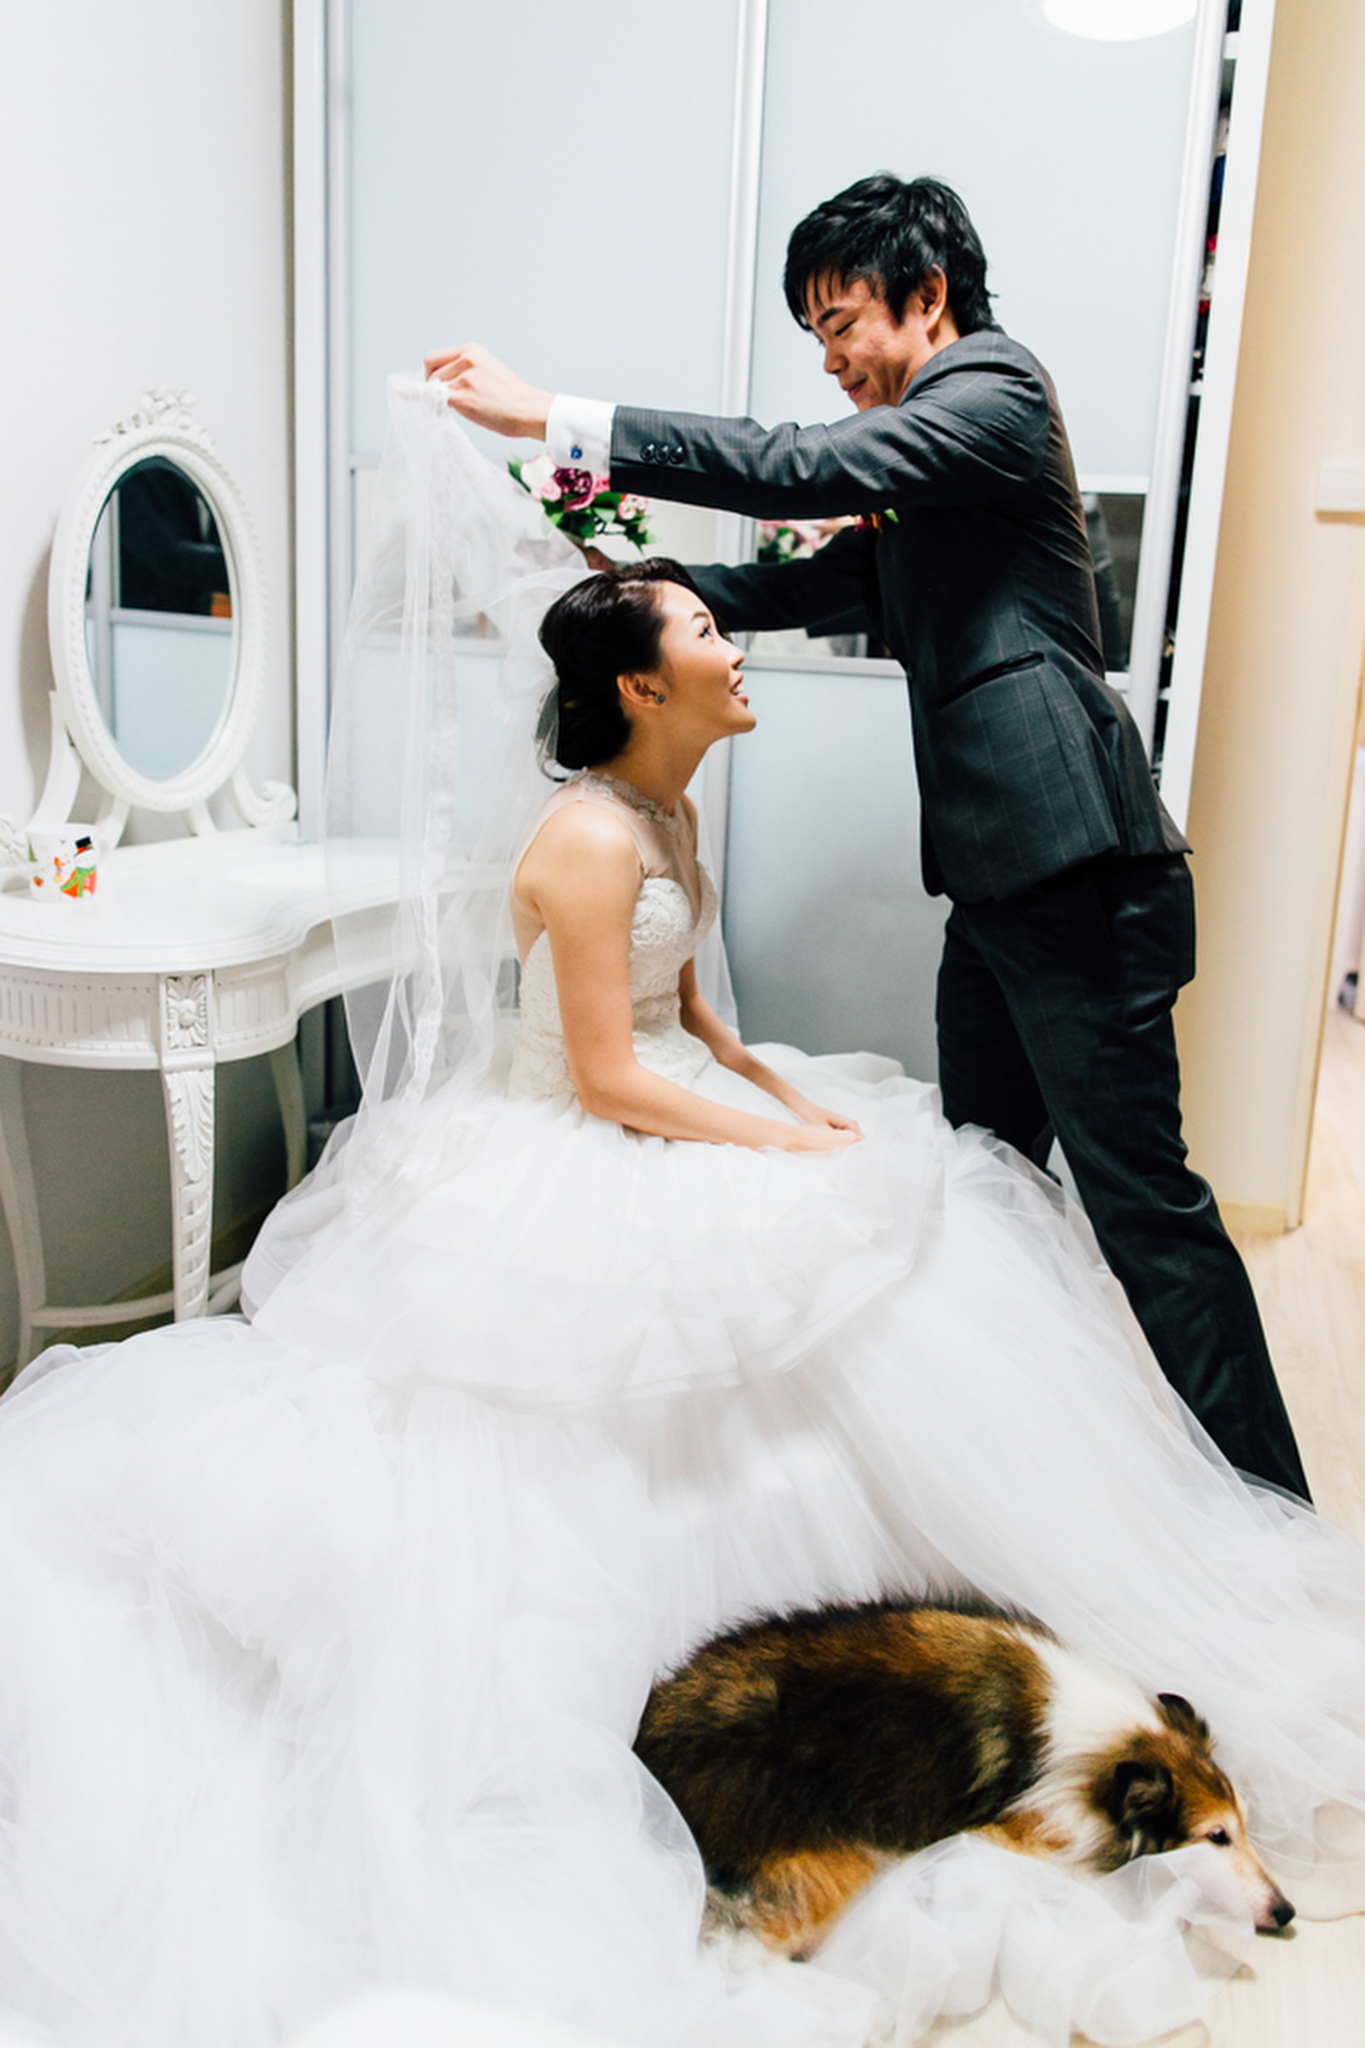 Singapore Wedding Photographer - Joey & Amily Wedding Day (39 of 154).JPG